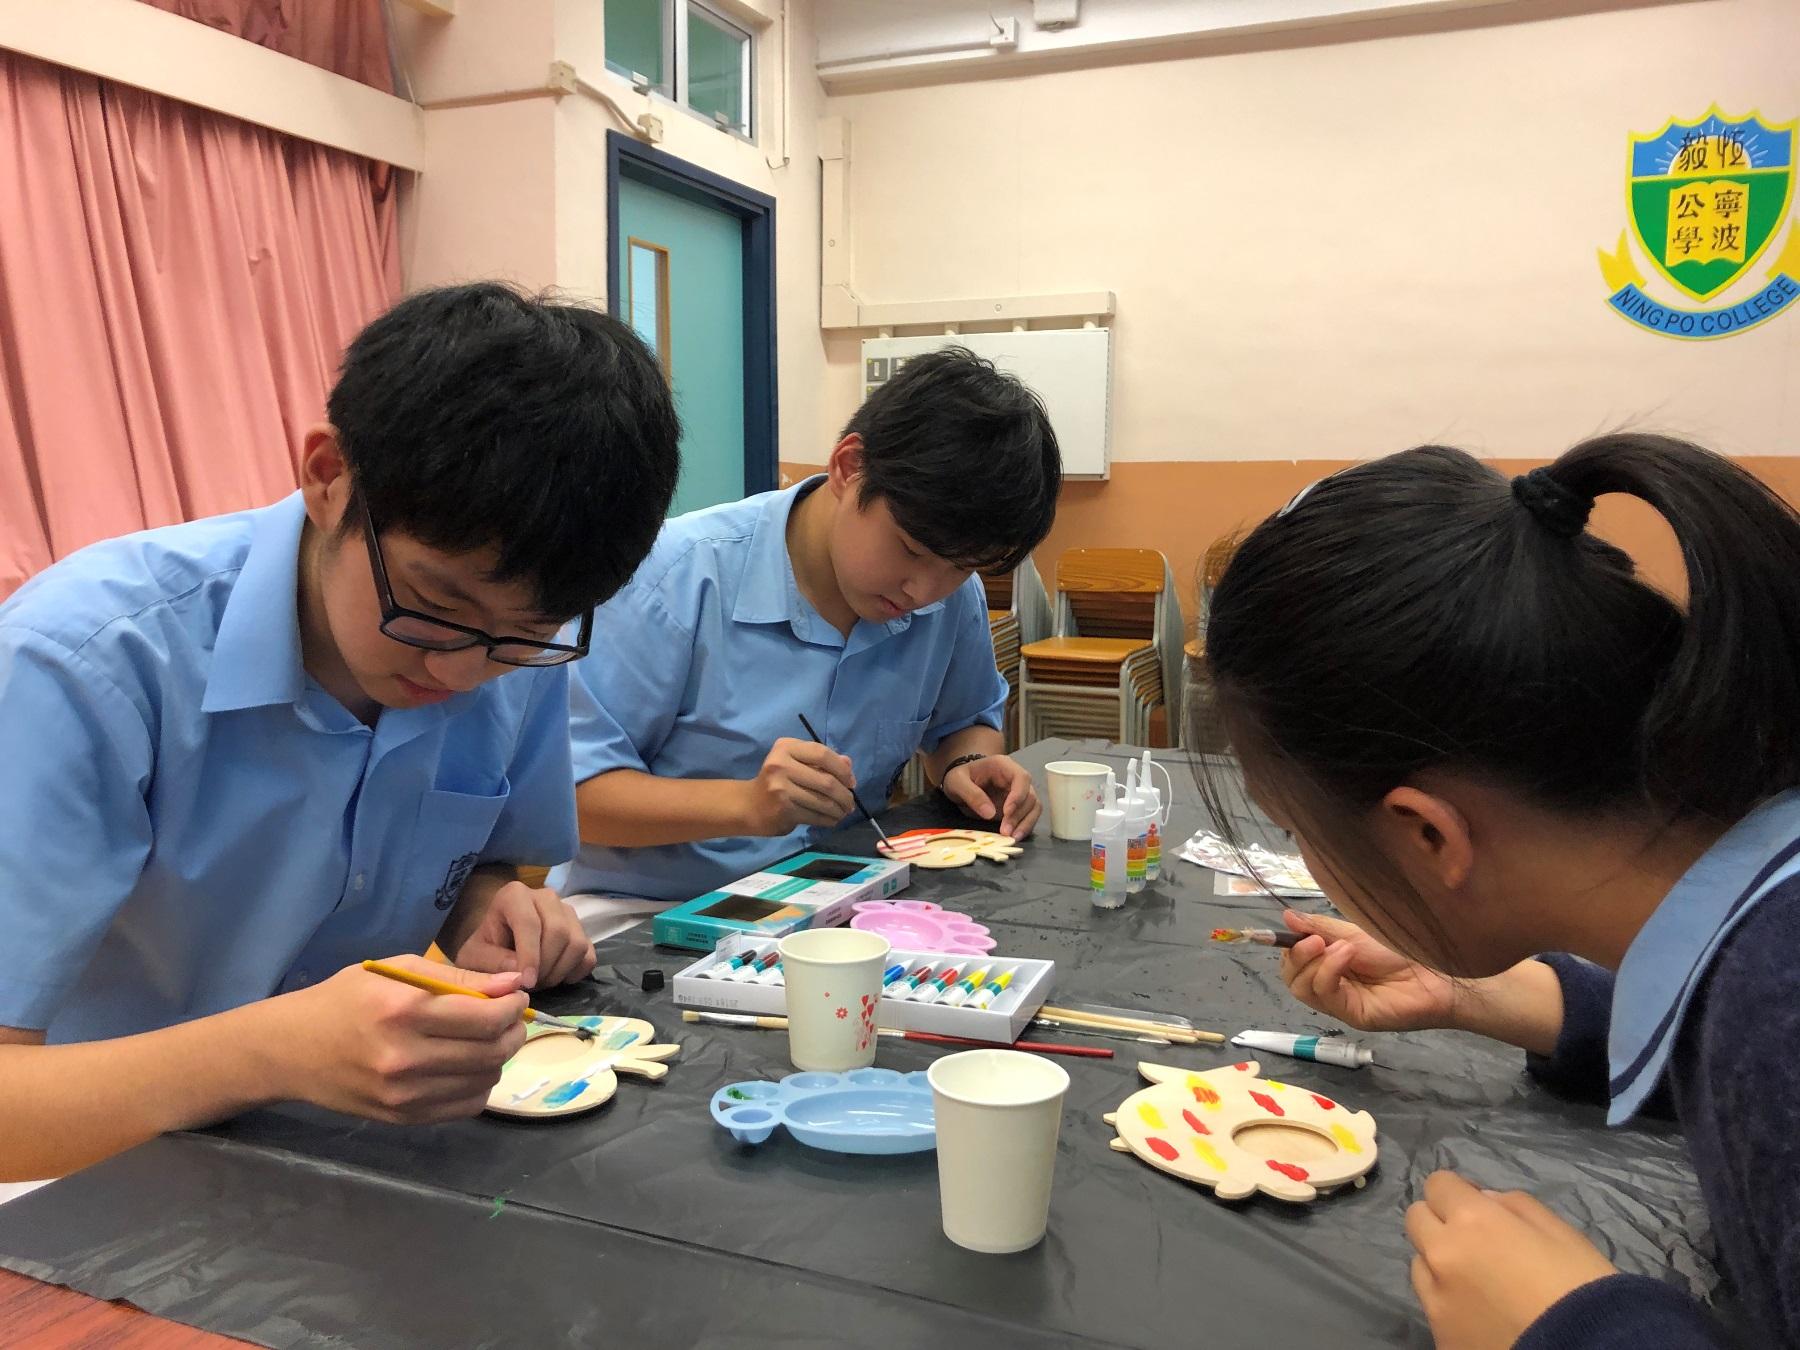 https://www.npc.edu.hk/sites/default/files/img_0970.jpg